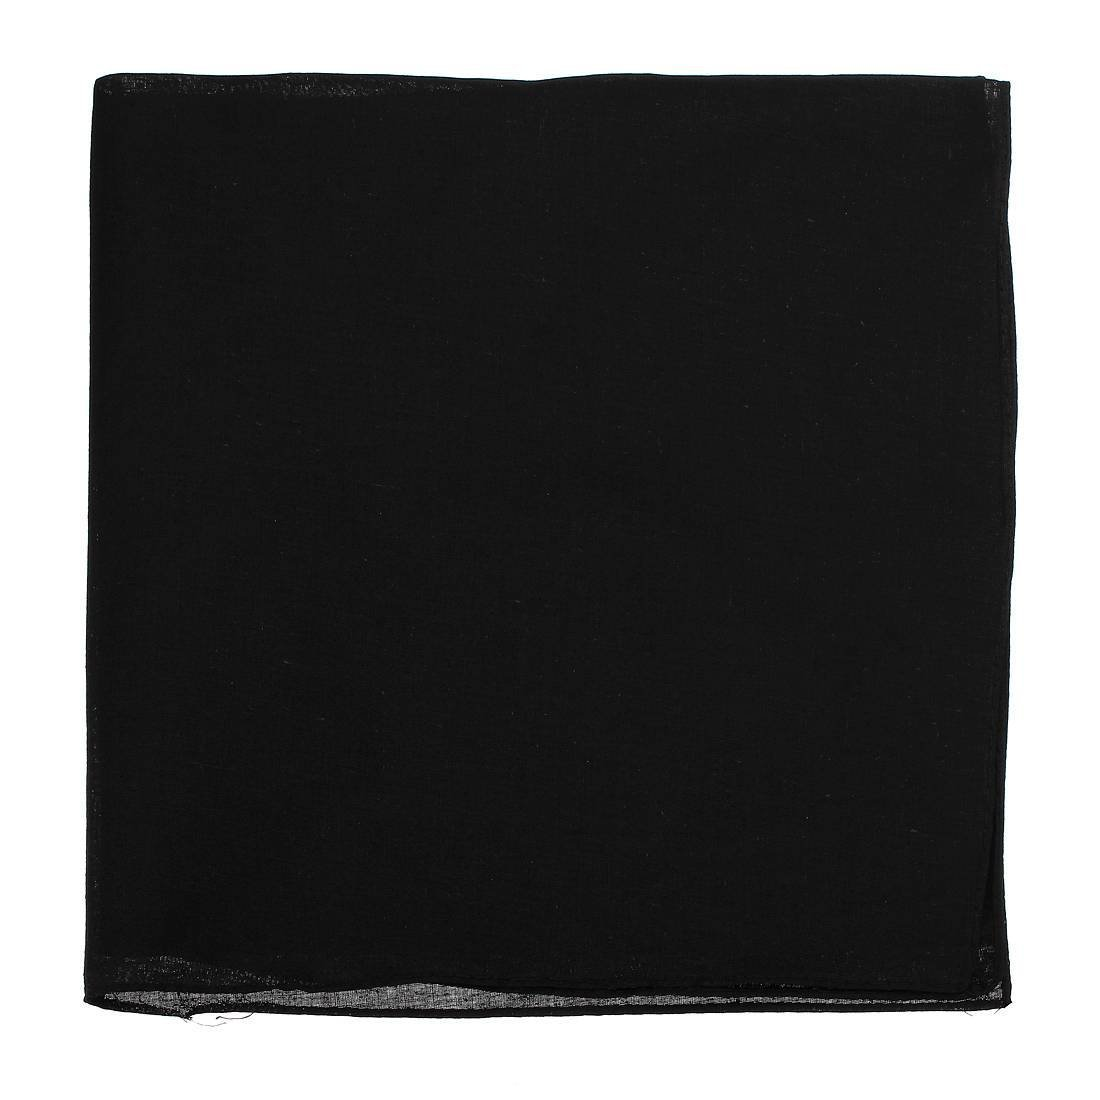 MYPF-Beanies Summer Cotton Beanie headscarf scarf cloth Women Men Unisex 54x54 Black